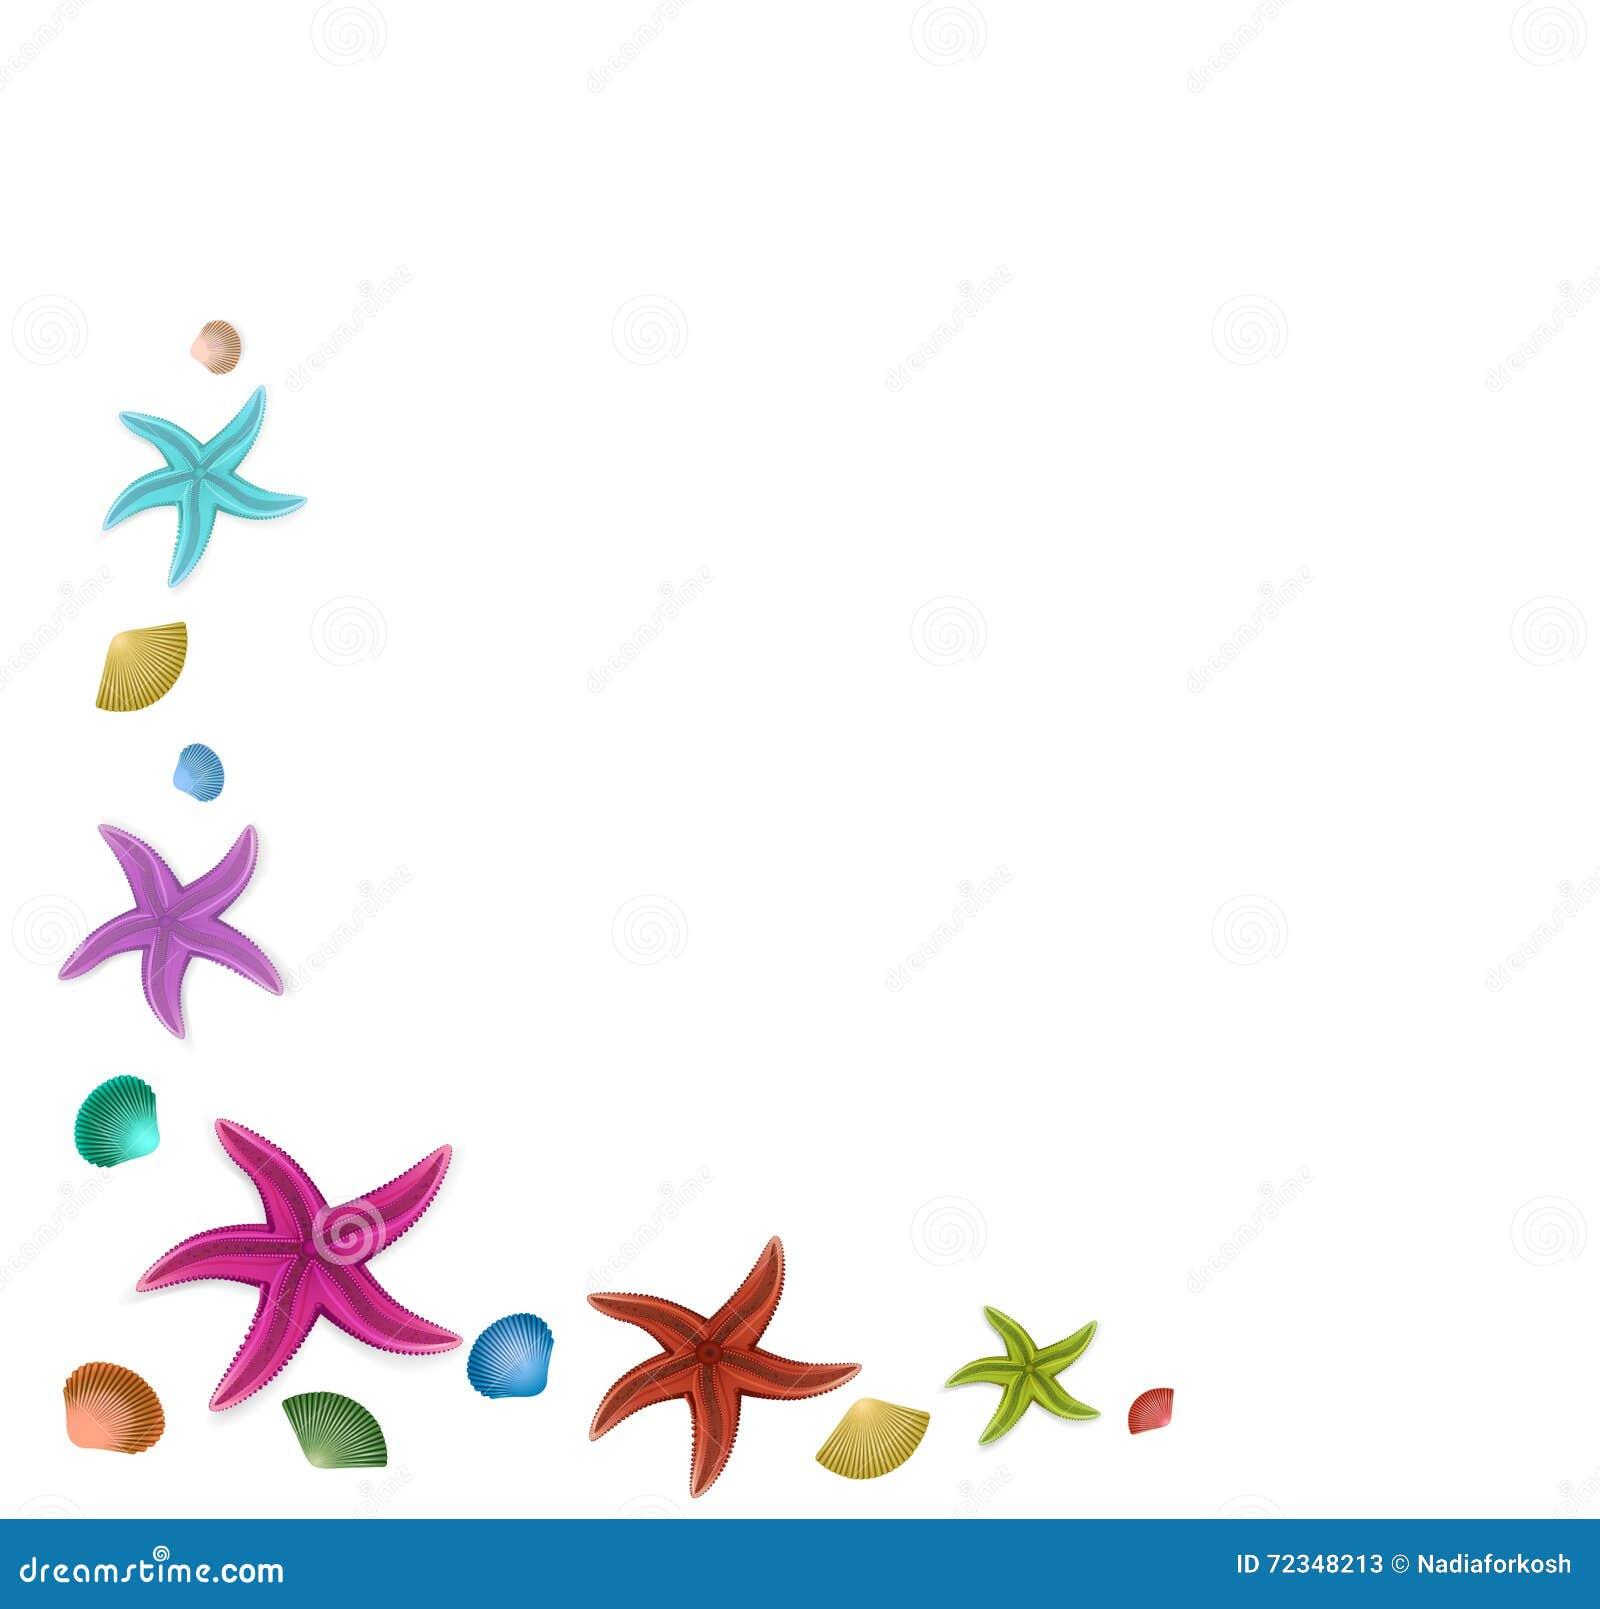 Starfish Frame Illustration 72348213 - Megapixl